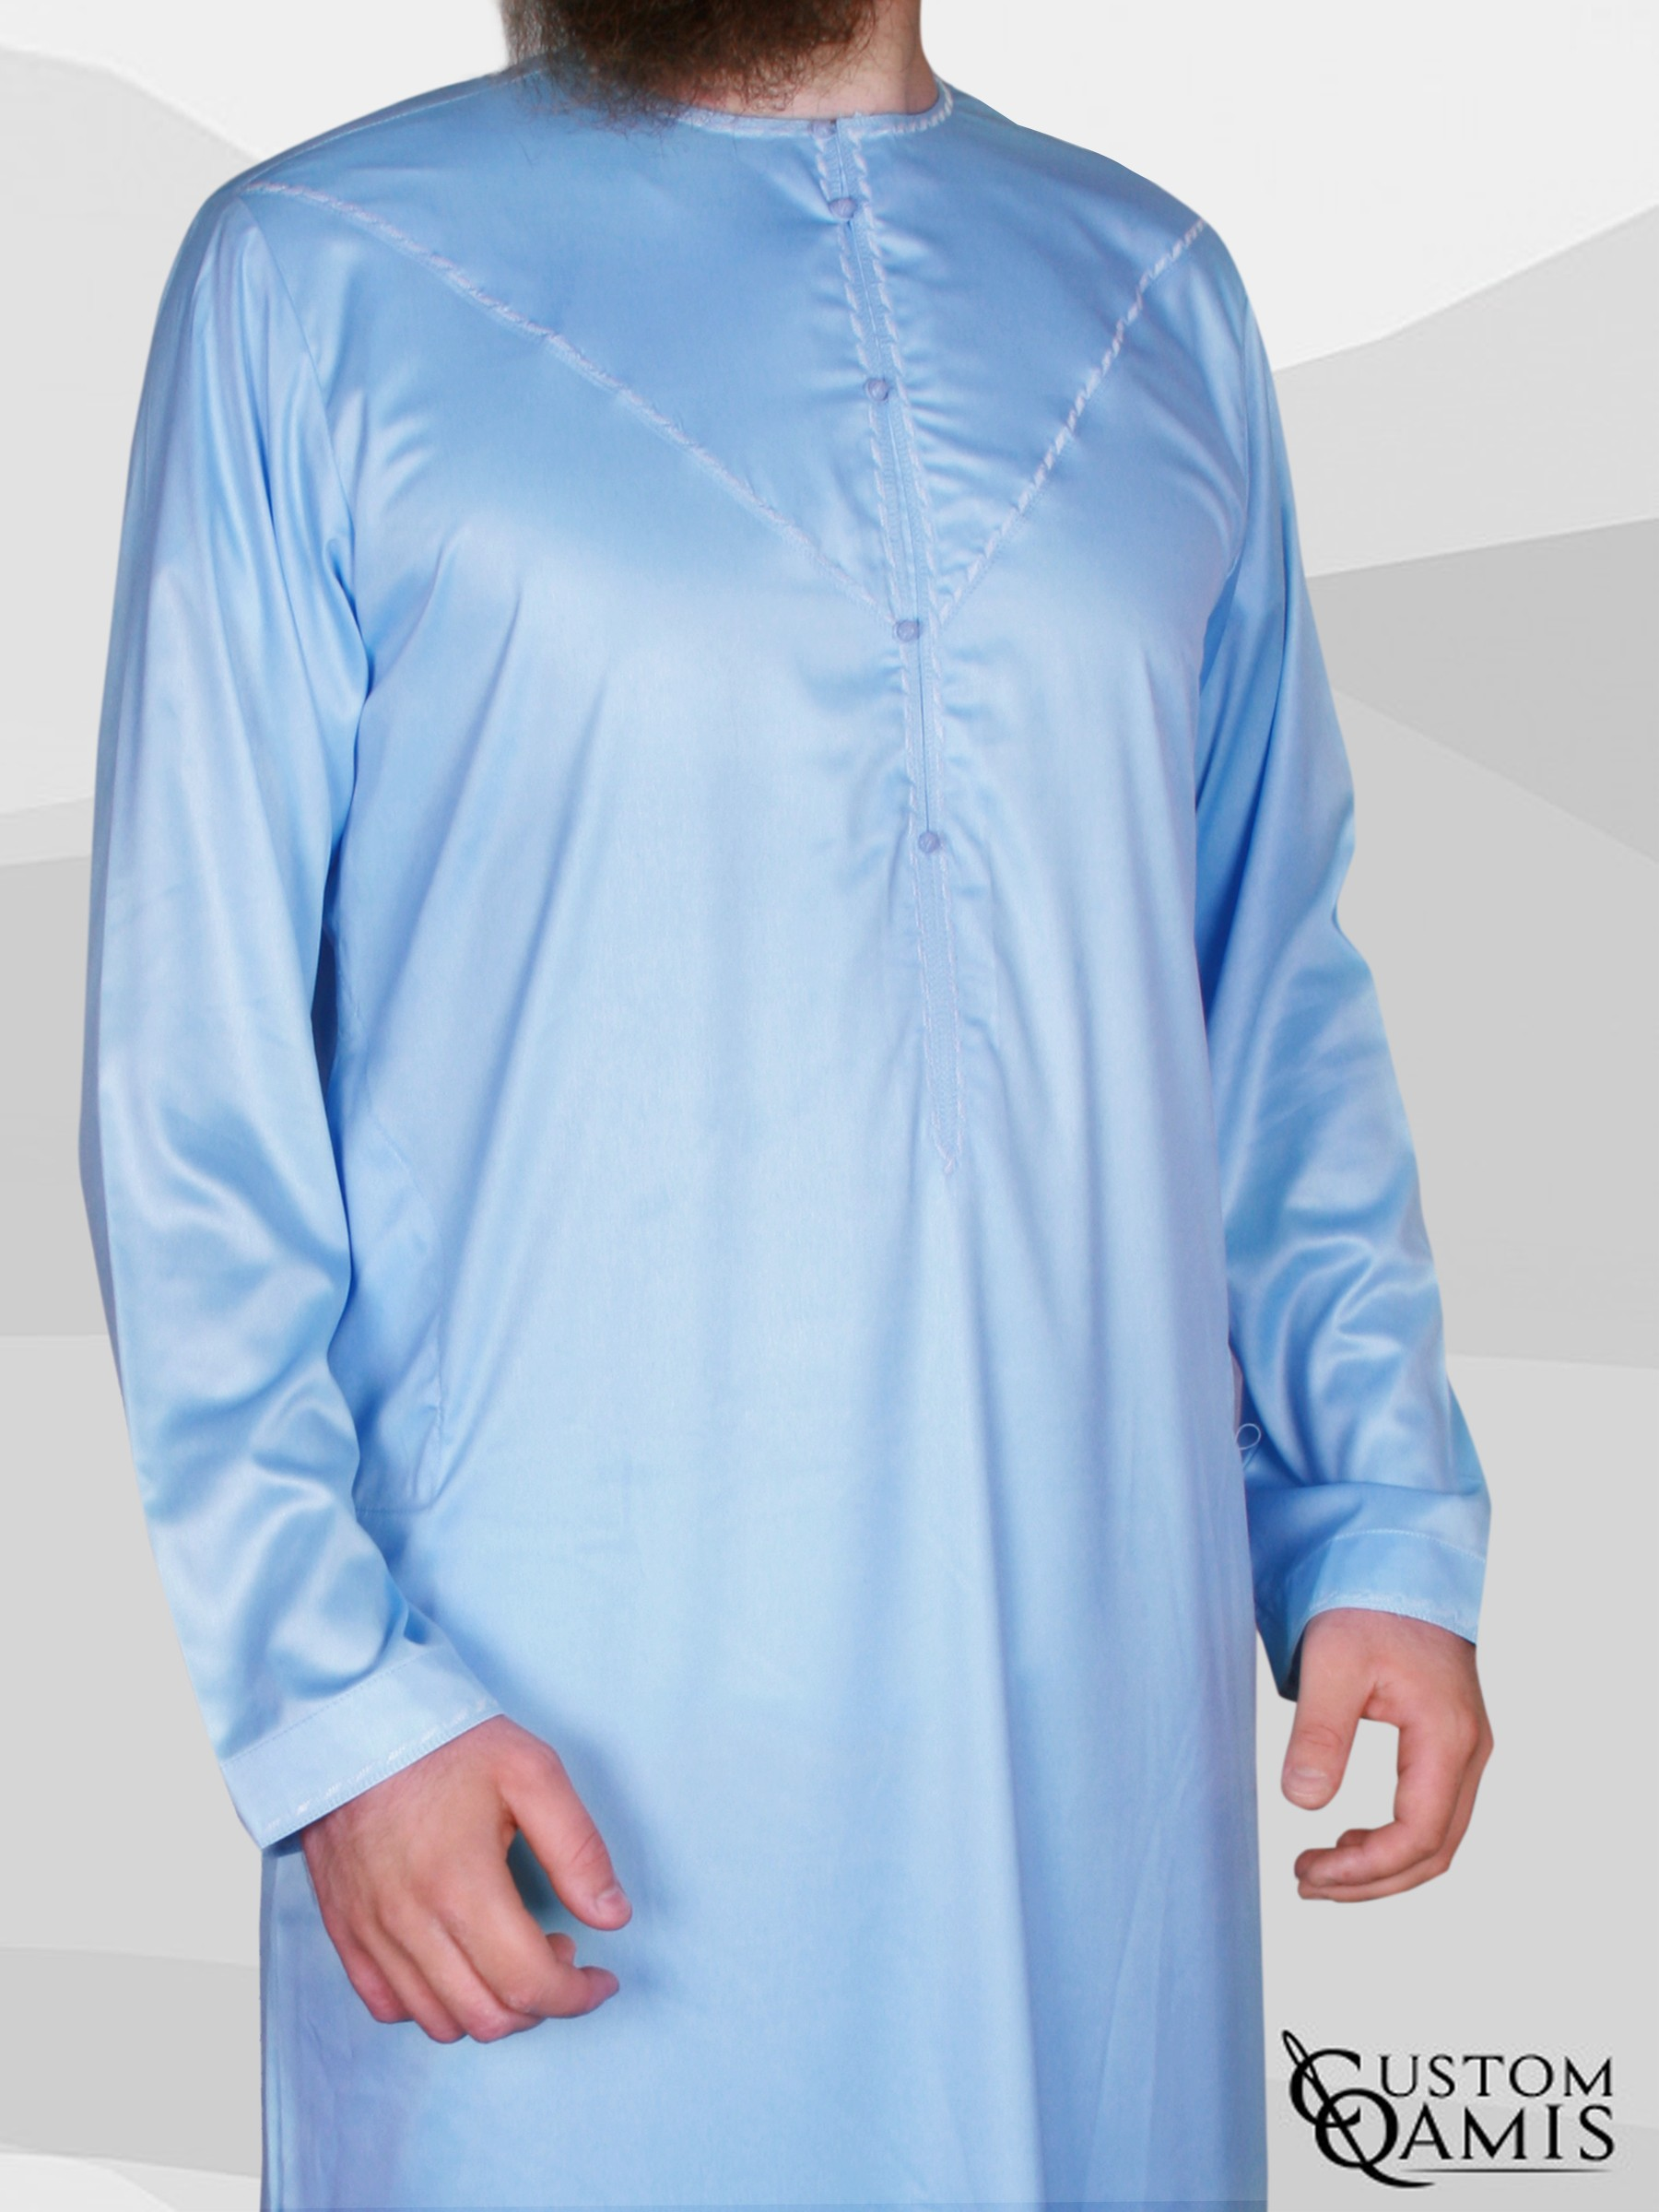 Emirati Thobe fabric Precious sky blue satin with white embroidery